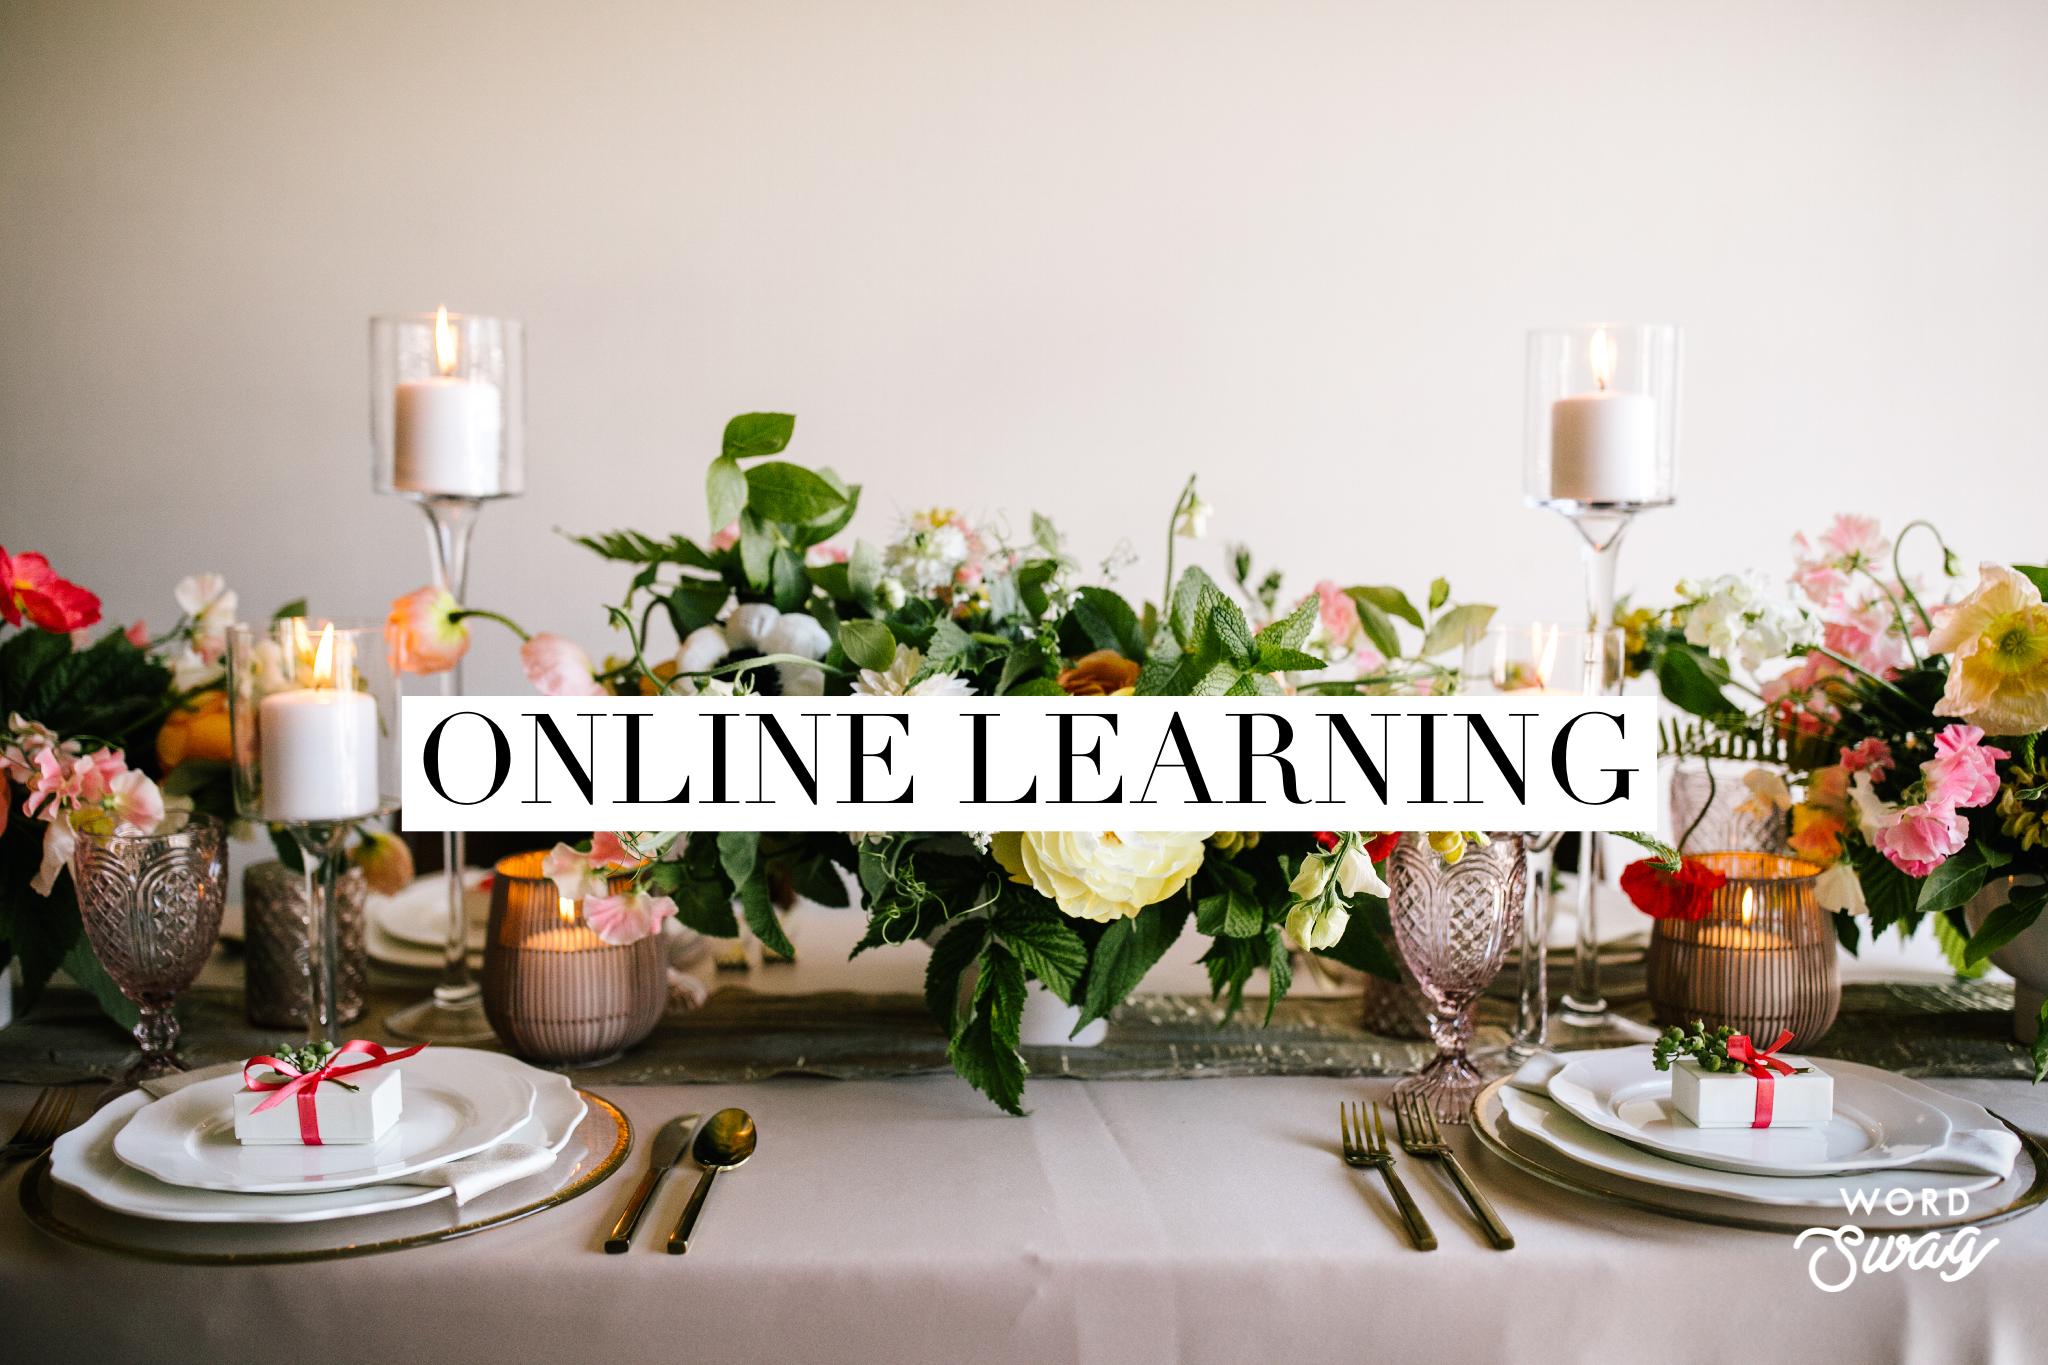 Online Learning Banner.PNG